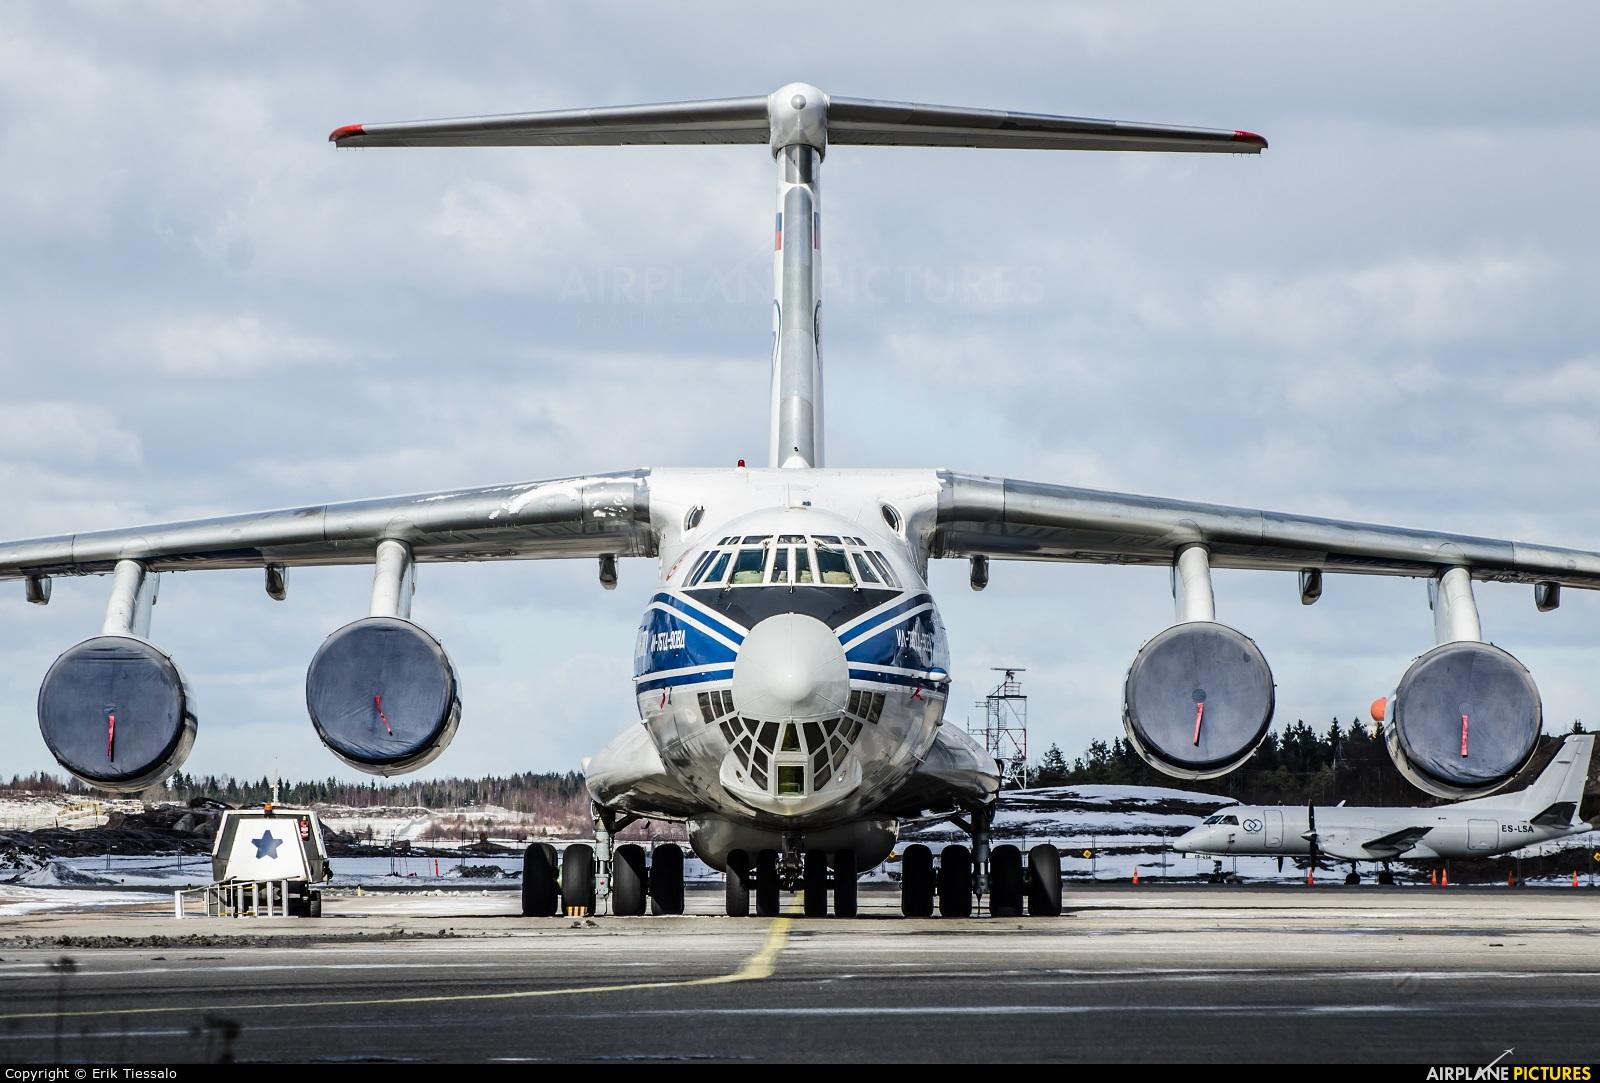 Volga Dnepr Airlines RA-76952 aircraft at Helsinki - Vantaa